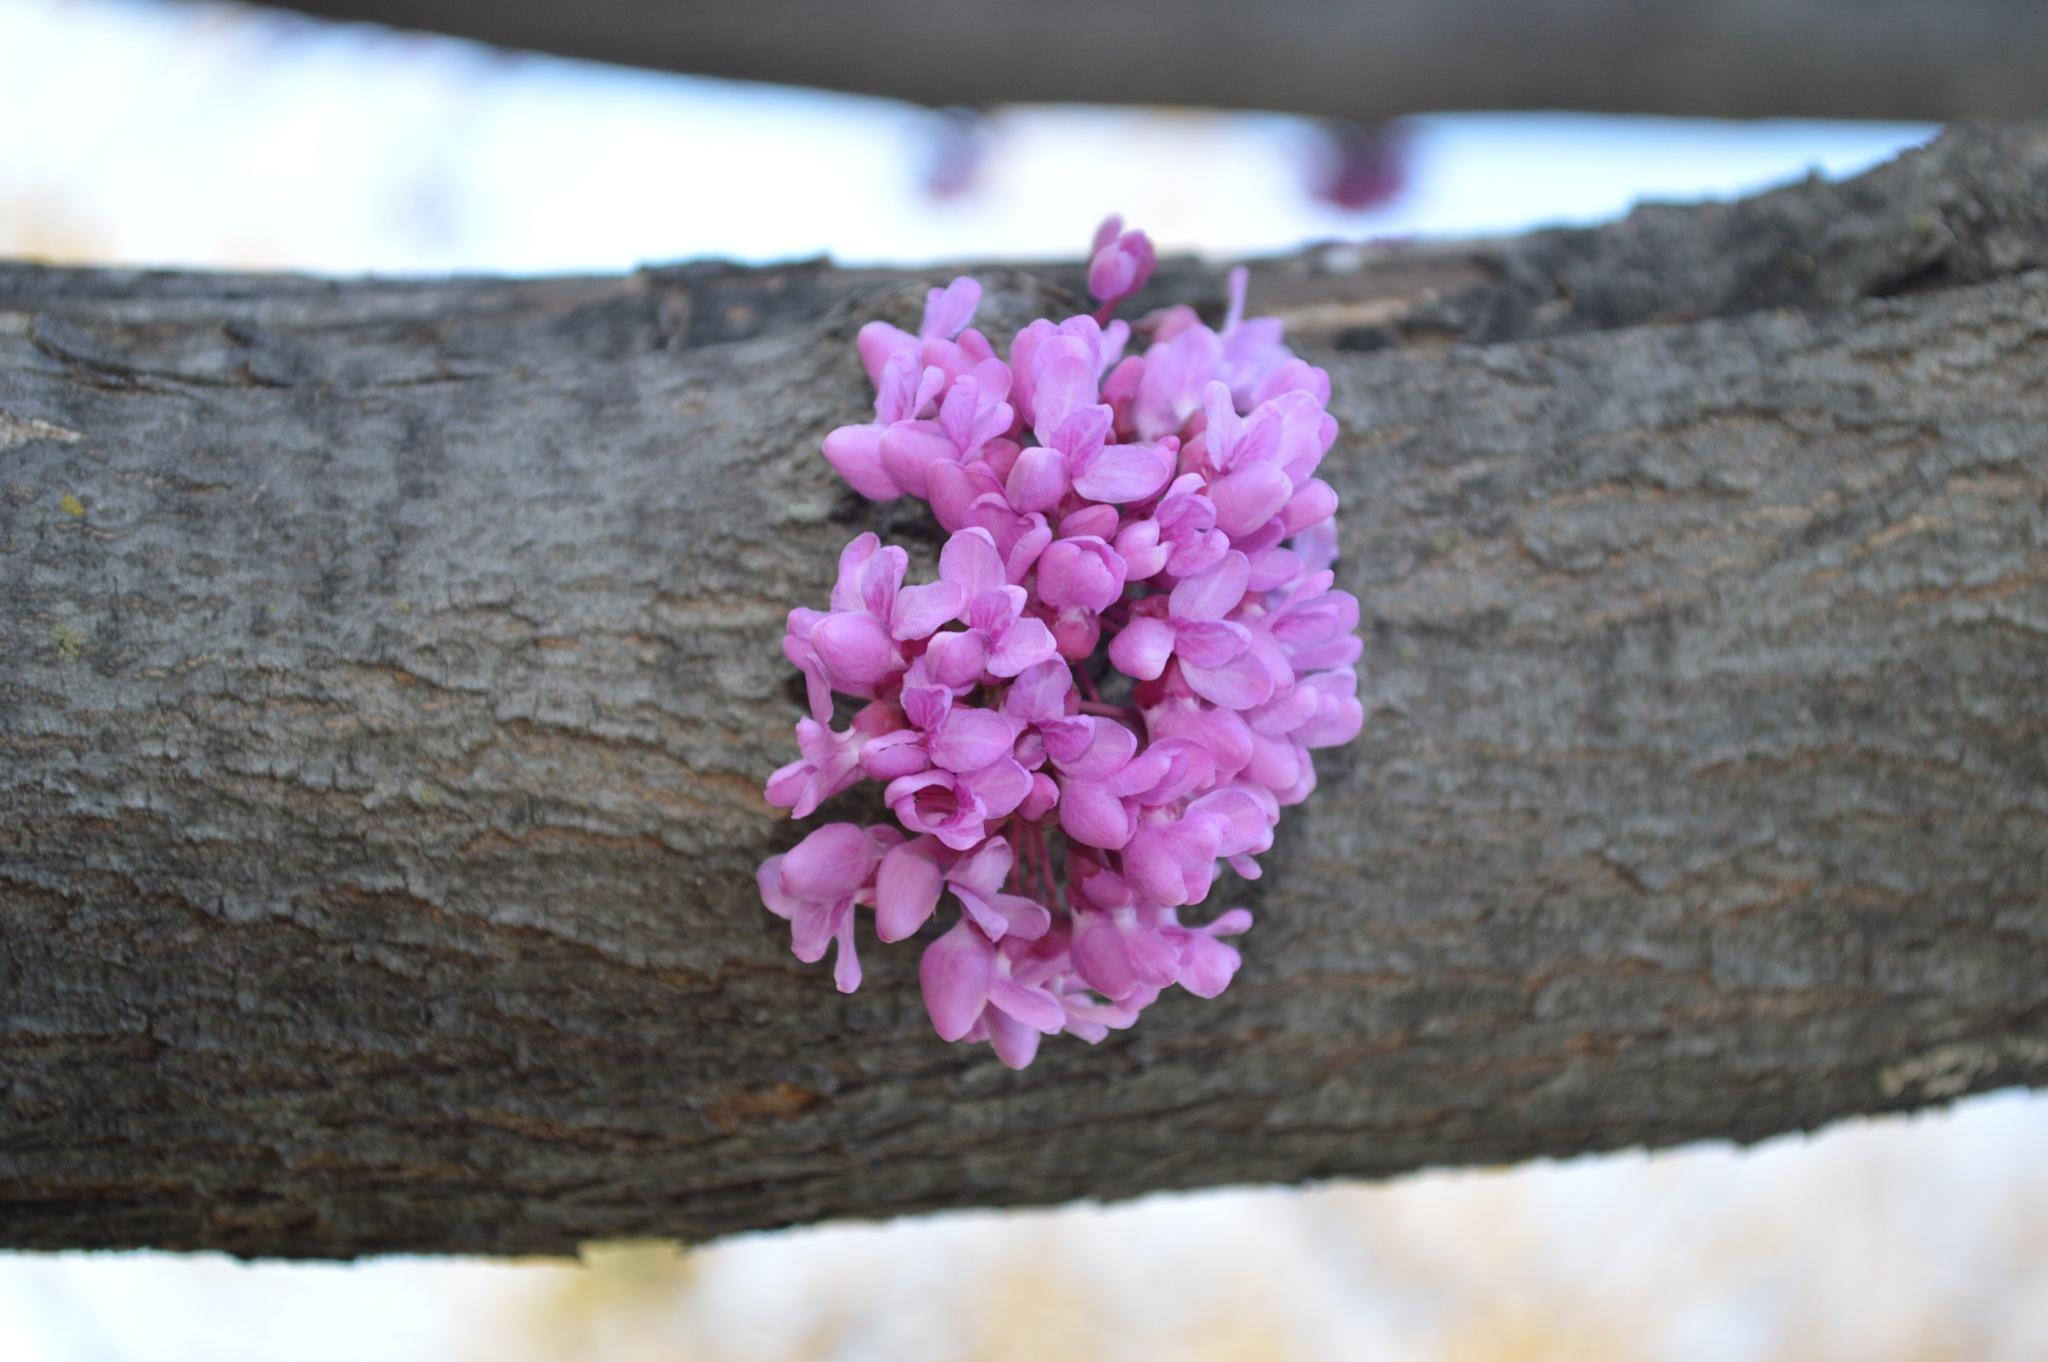 redbud tree by Milenslife